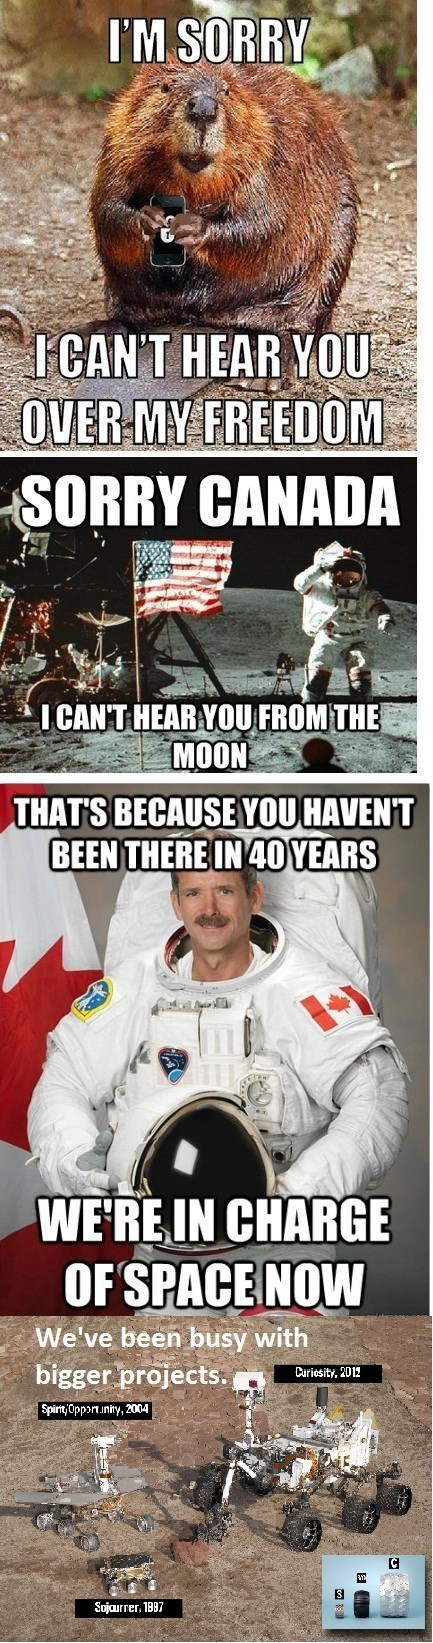 Canada america funny space - 8115762944